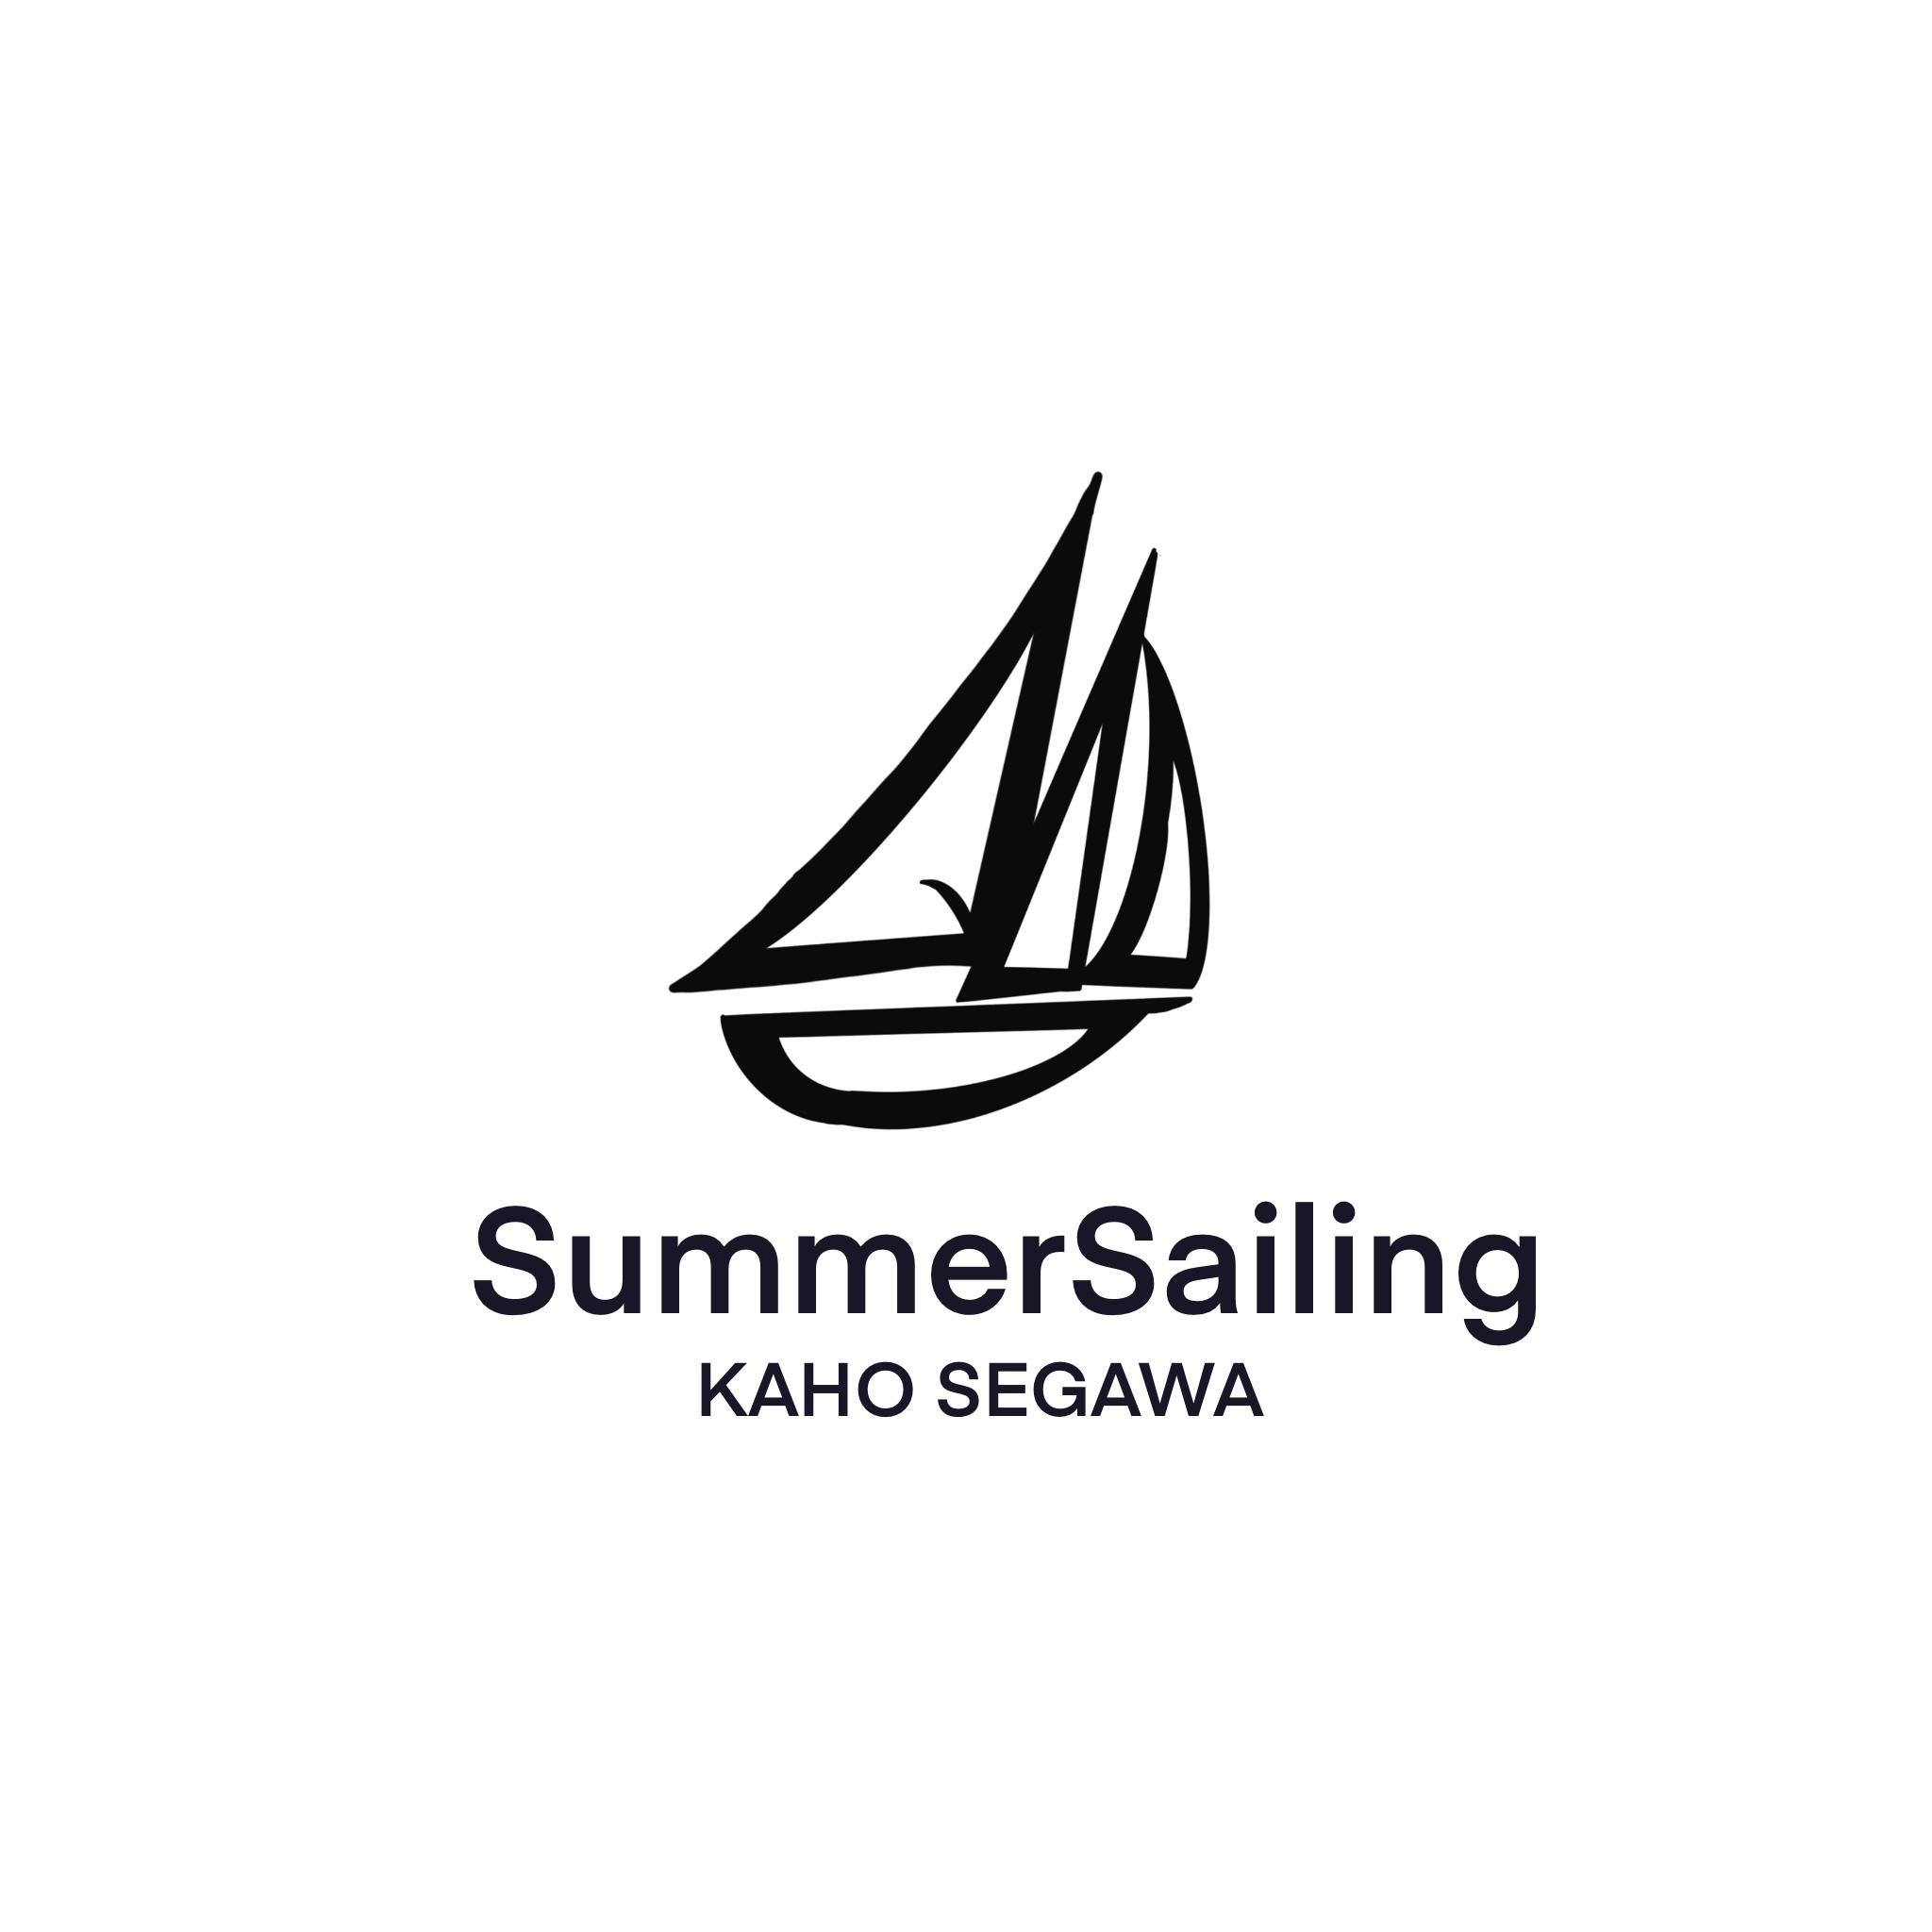 SummerSailing